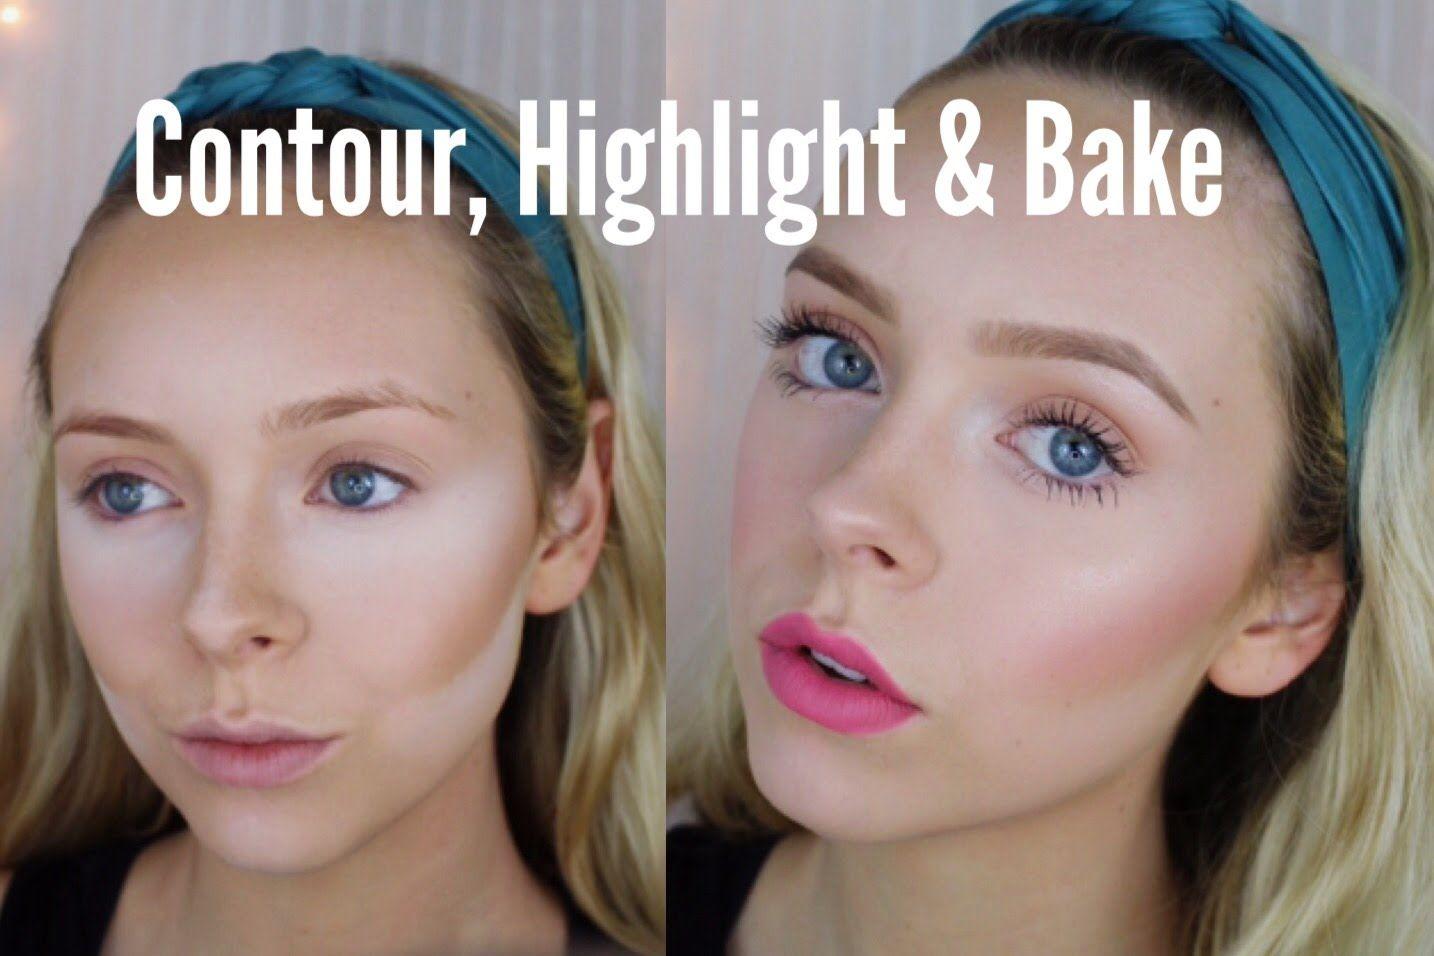 How To Contour, Highlight & Bake Cosmobyhaley Fair